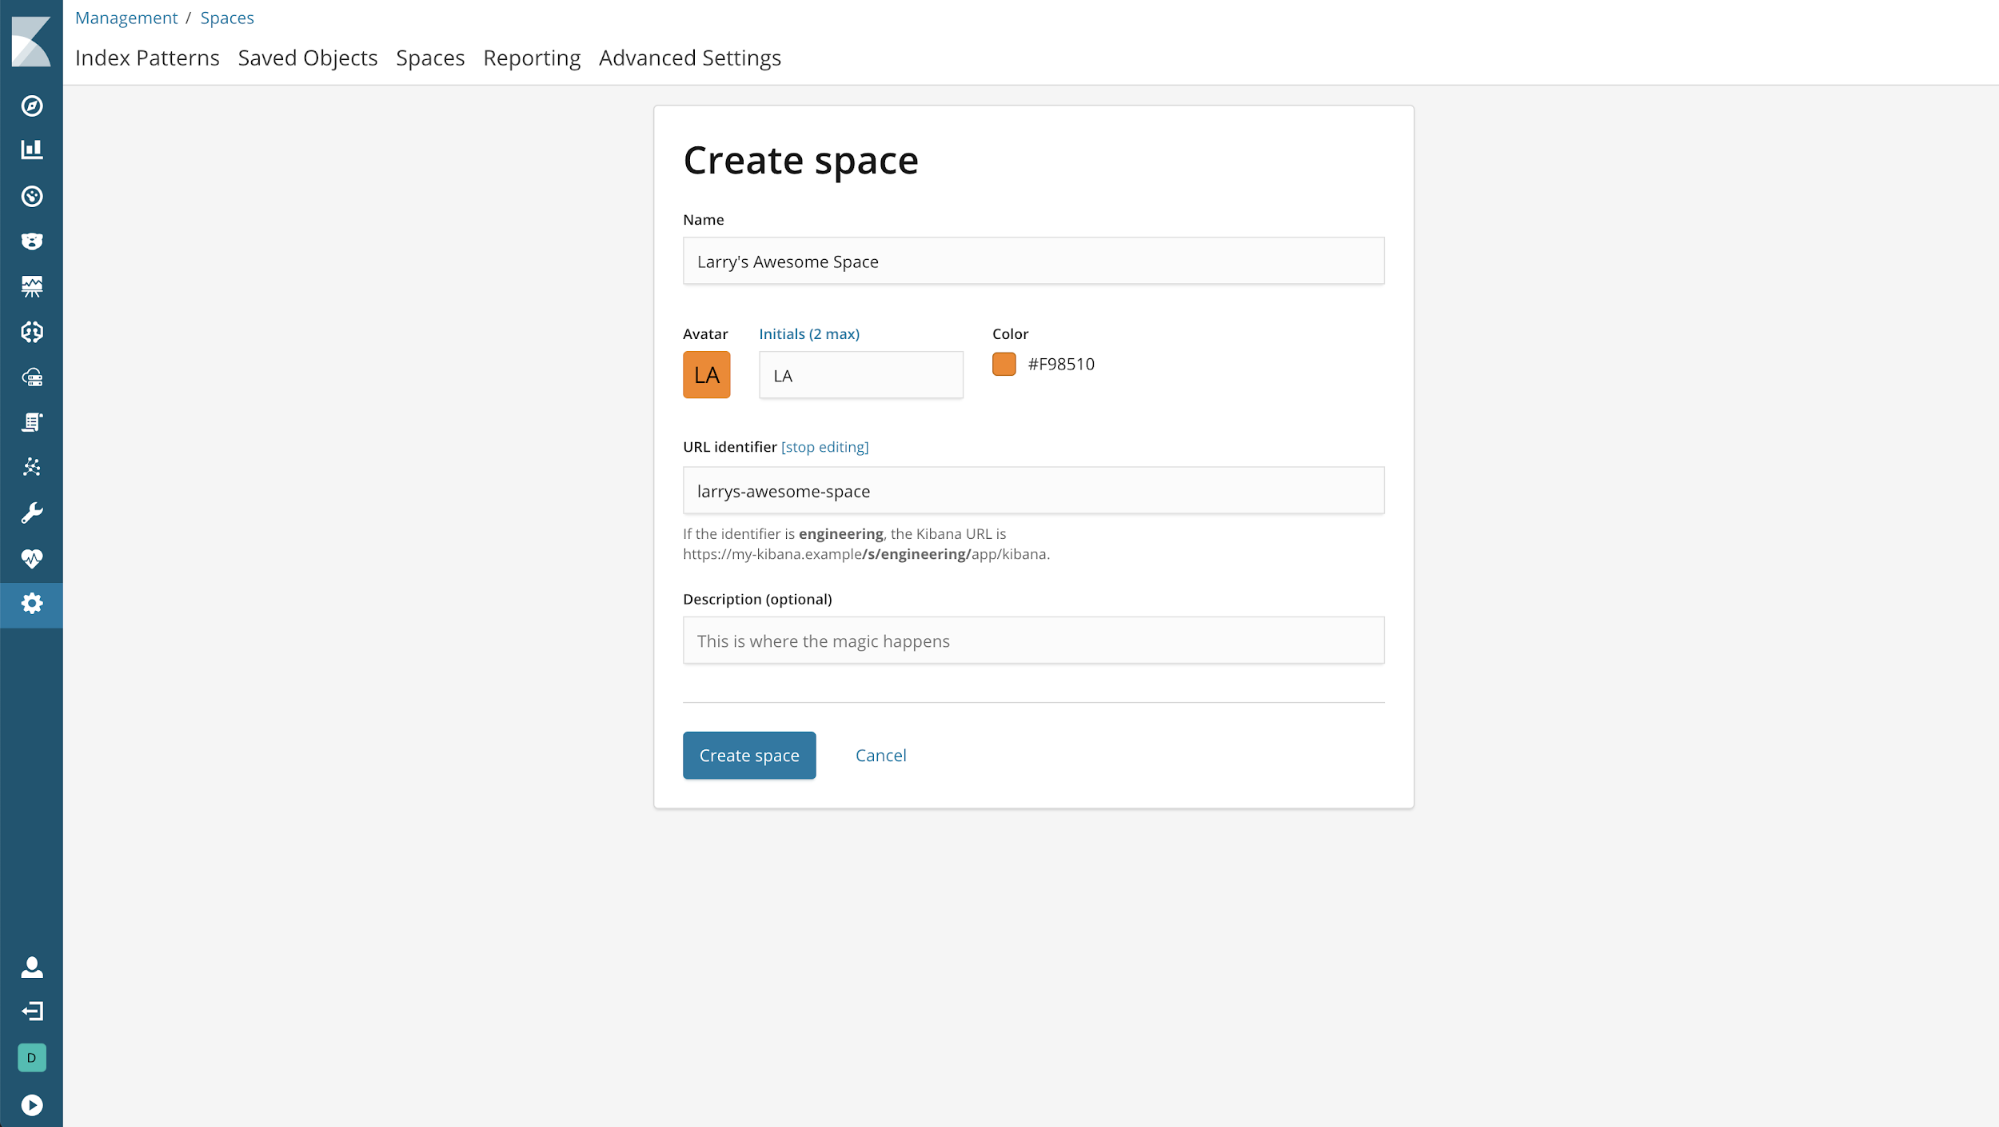 kibana 6.5.0 create space